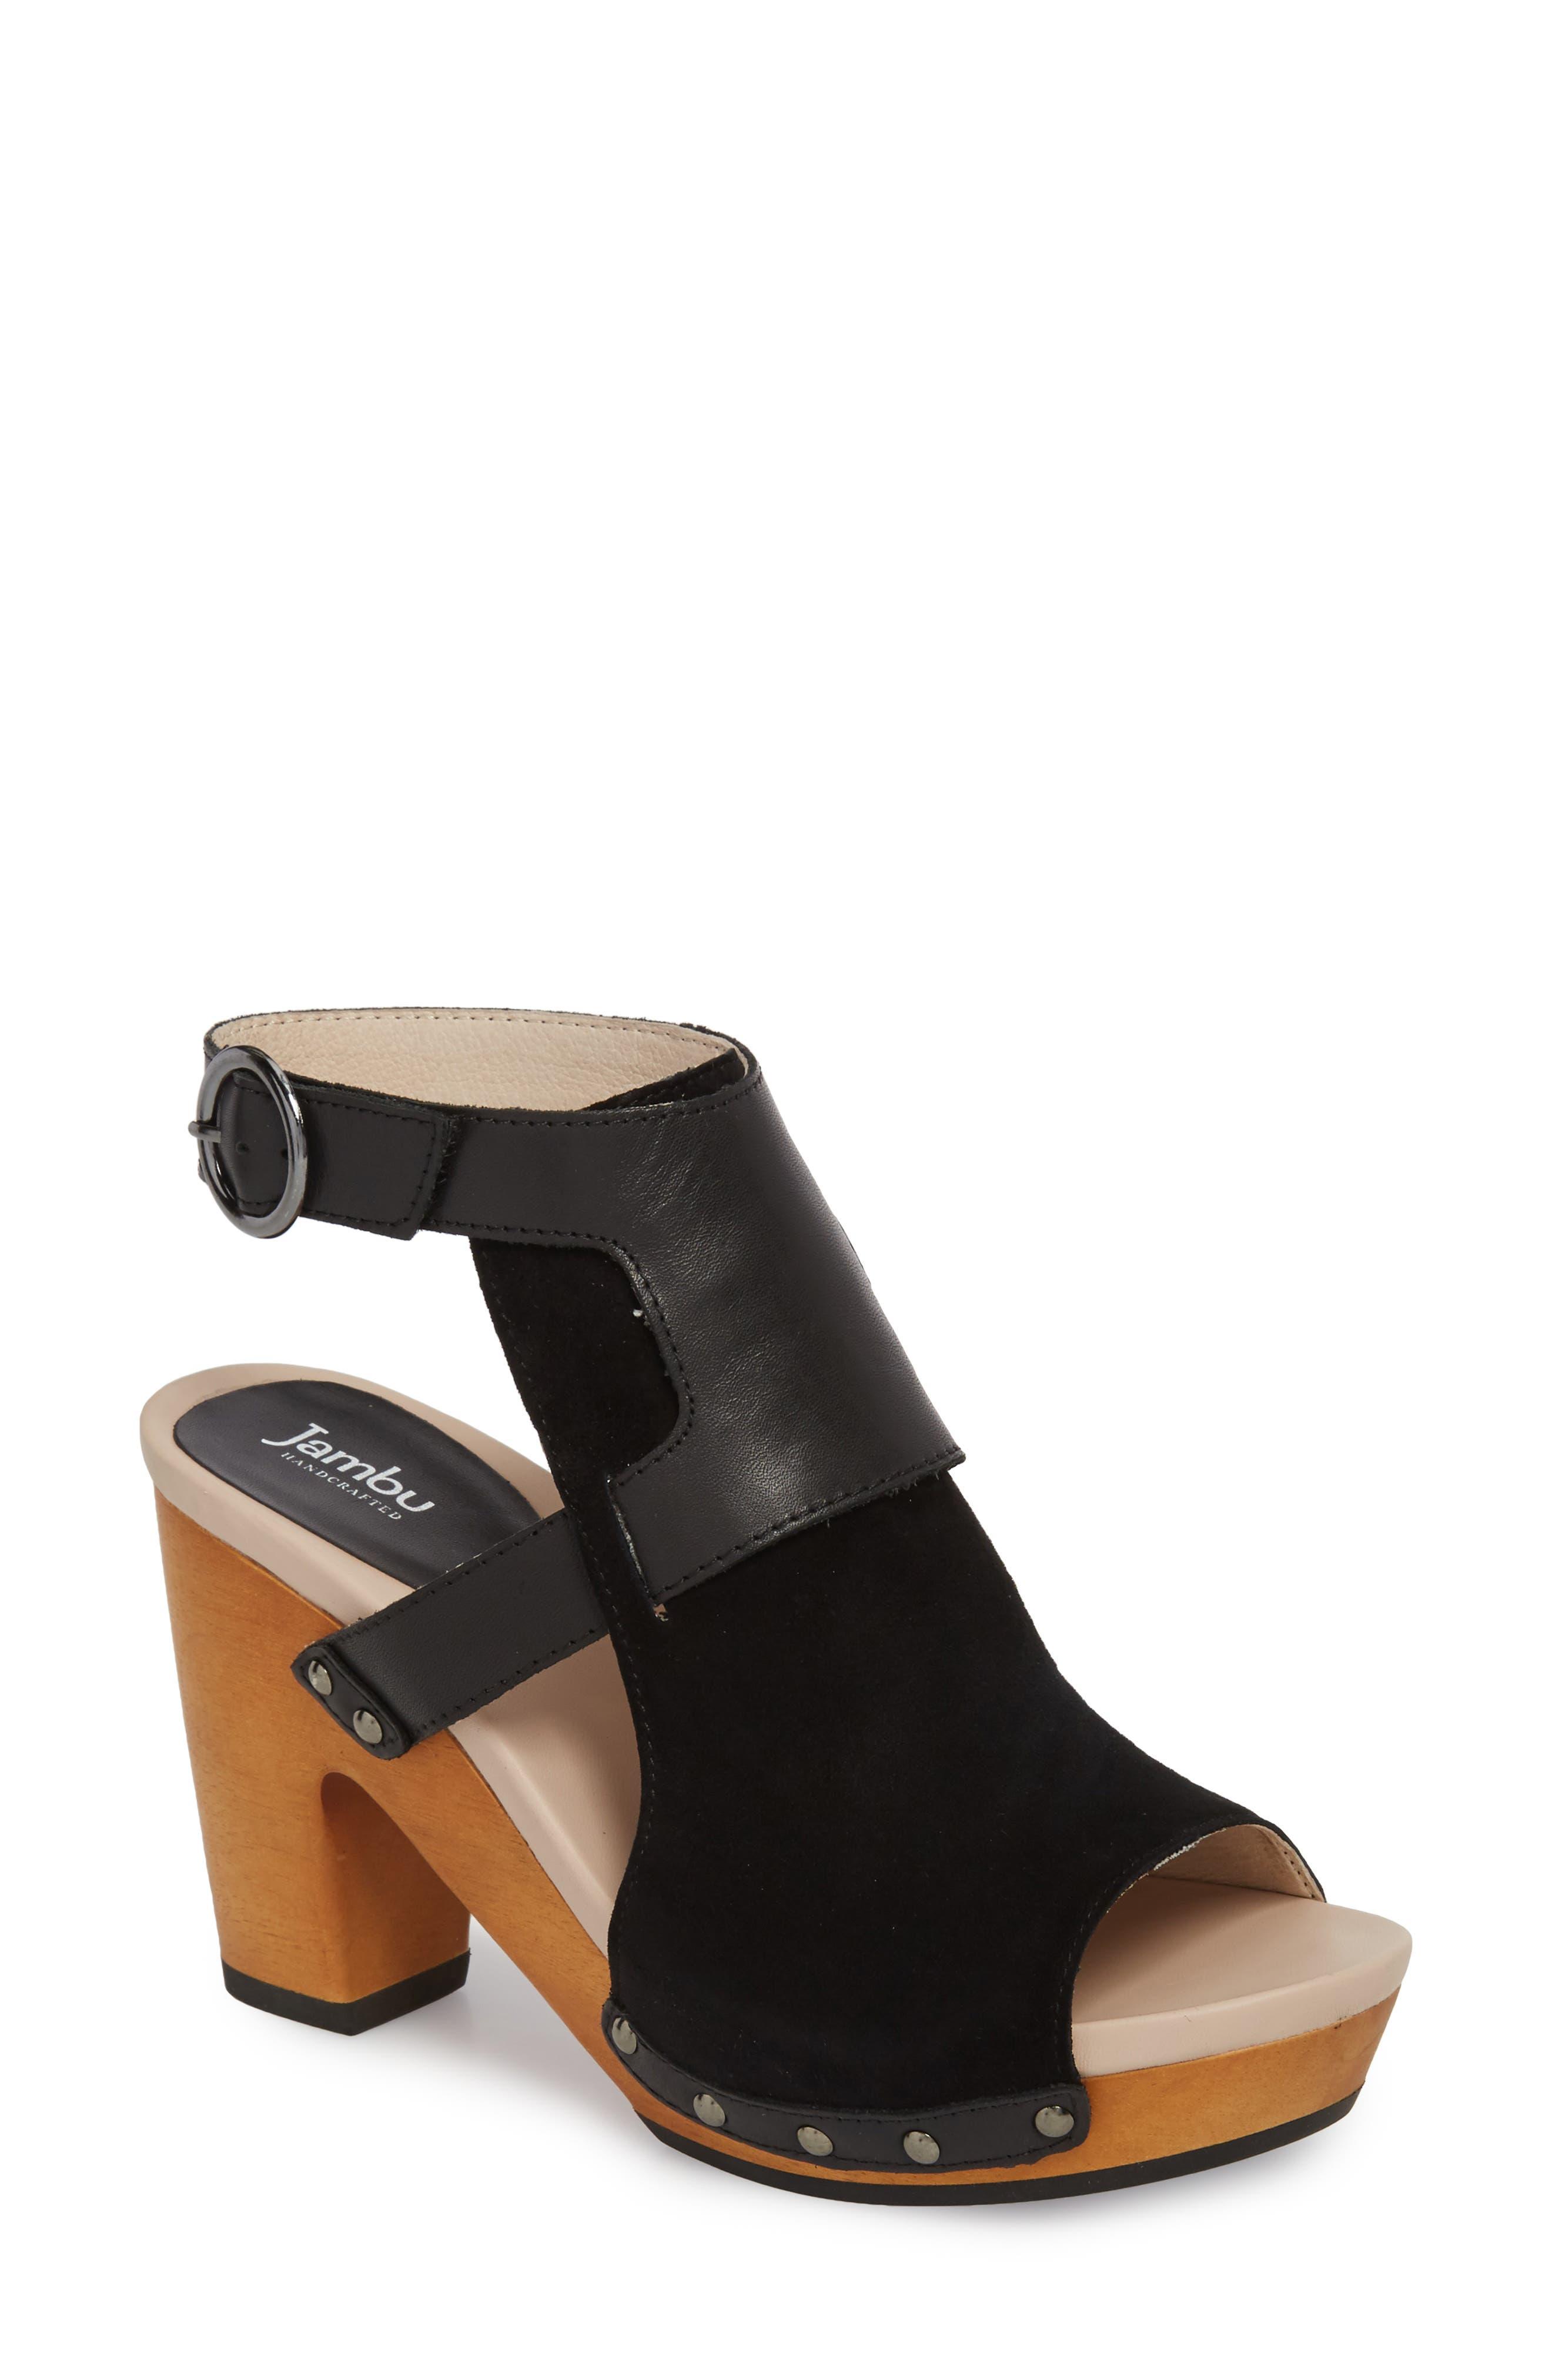 Gina Platform Sandal,                             Main thumbnail 1, color,                             BLACK LEATHER